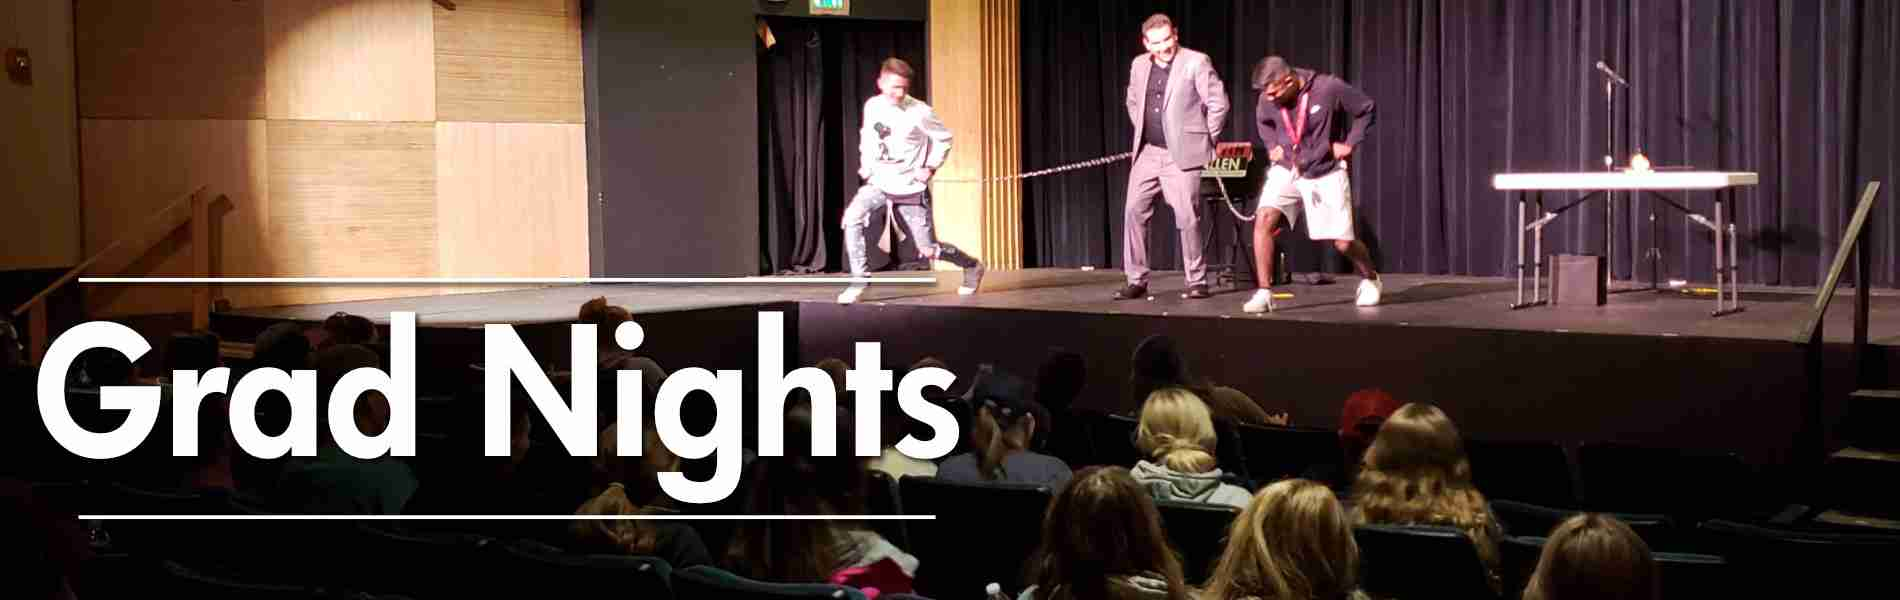 Comedy Magician Grad Night Entertainment header pic